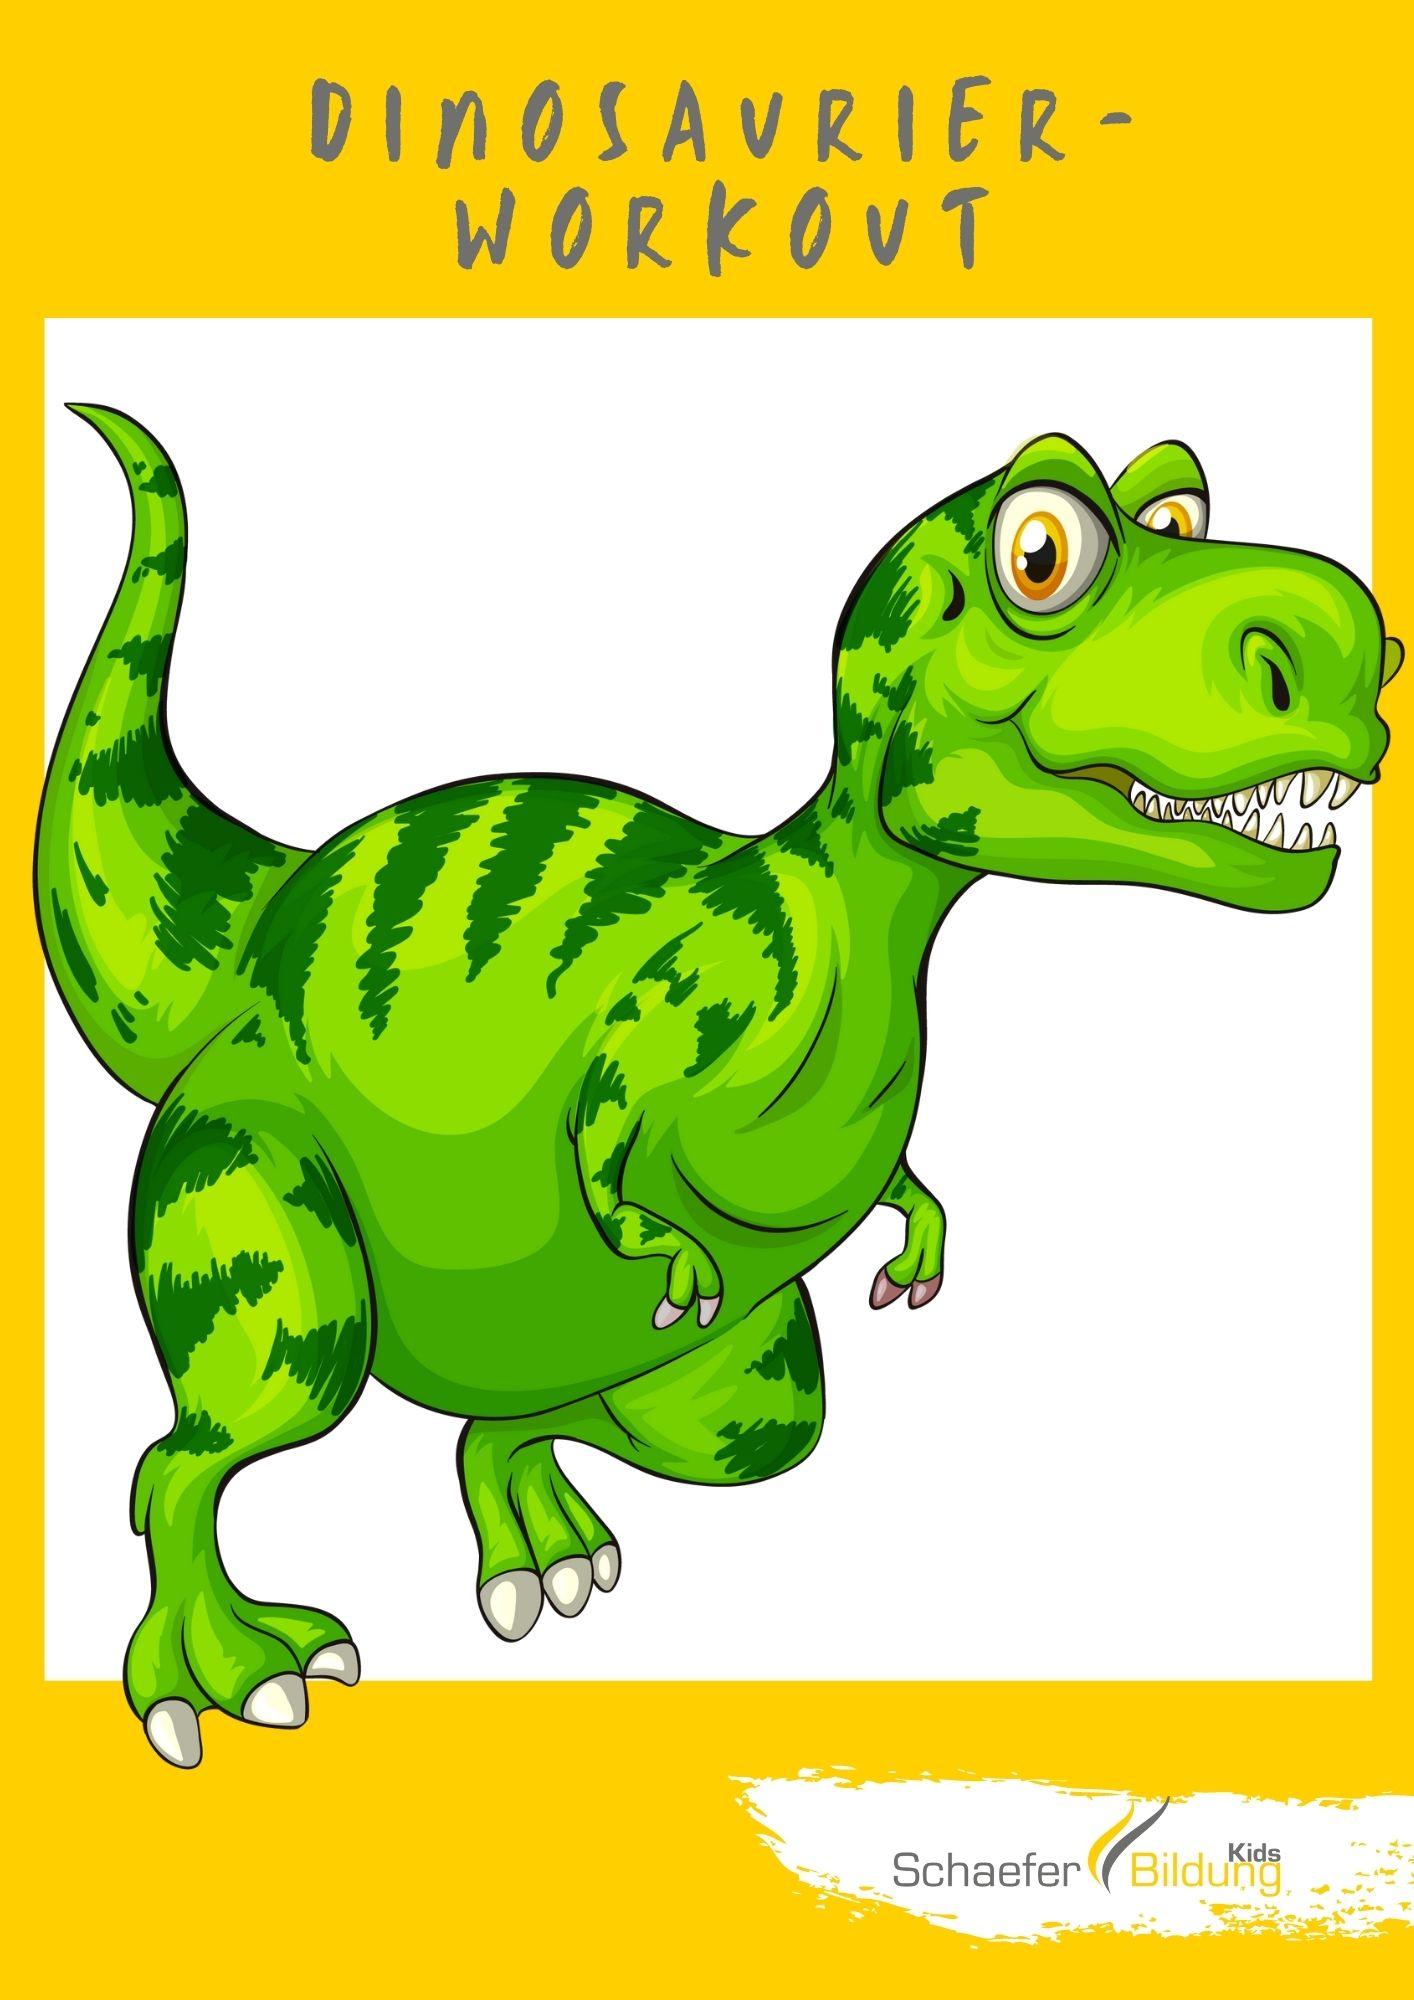 Dinosaurier Workout